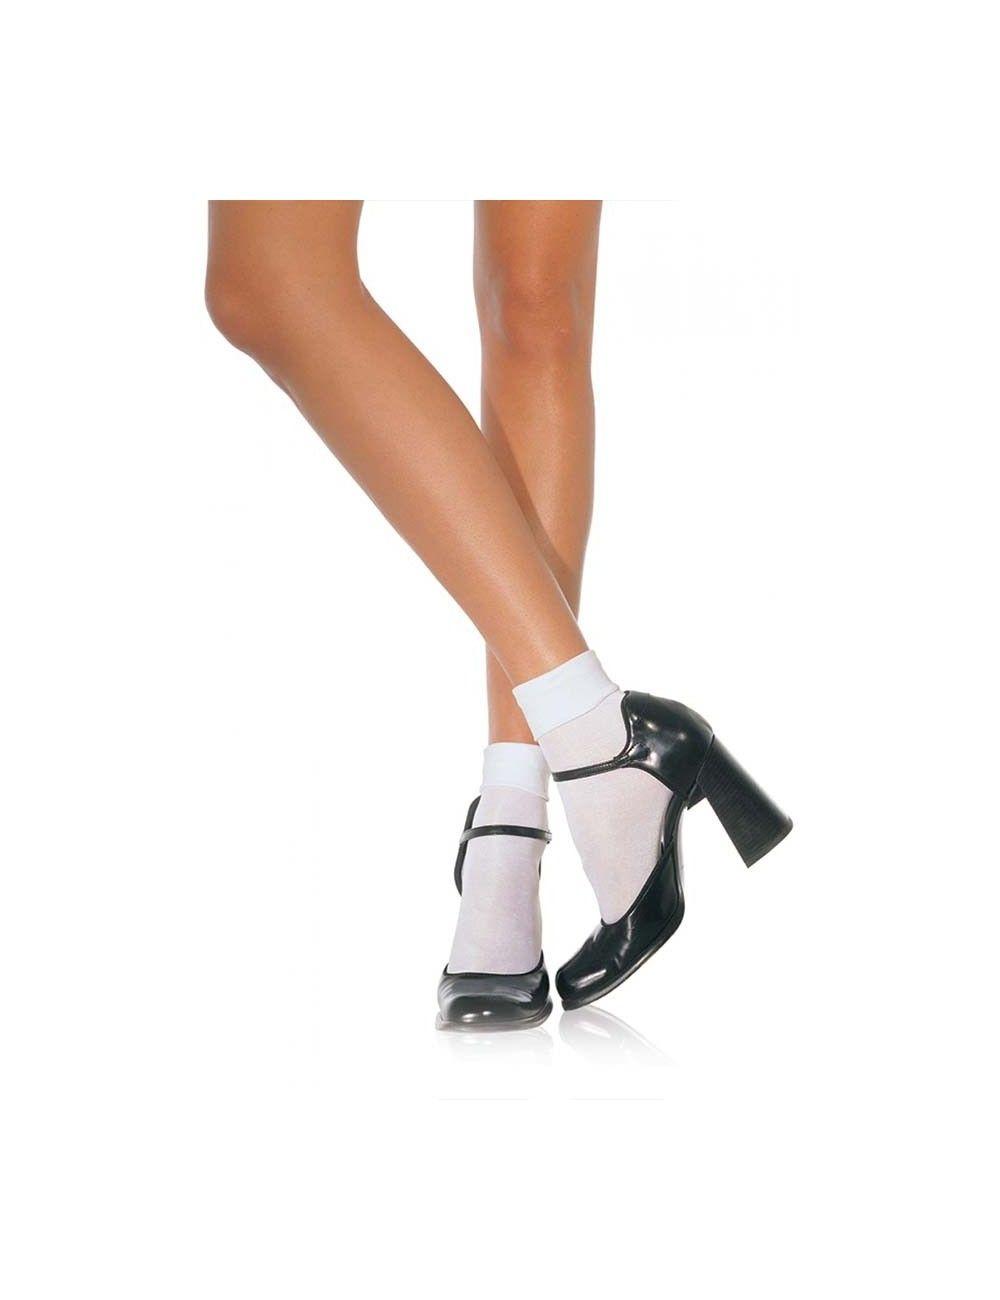 Soquettes blanches opaques LEG AVENUE